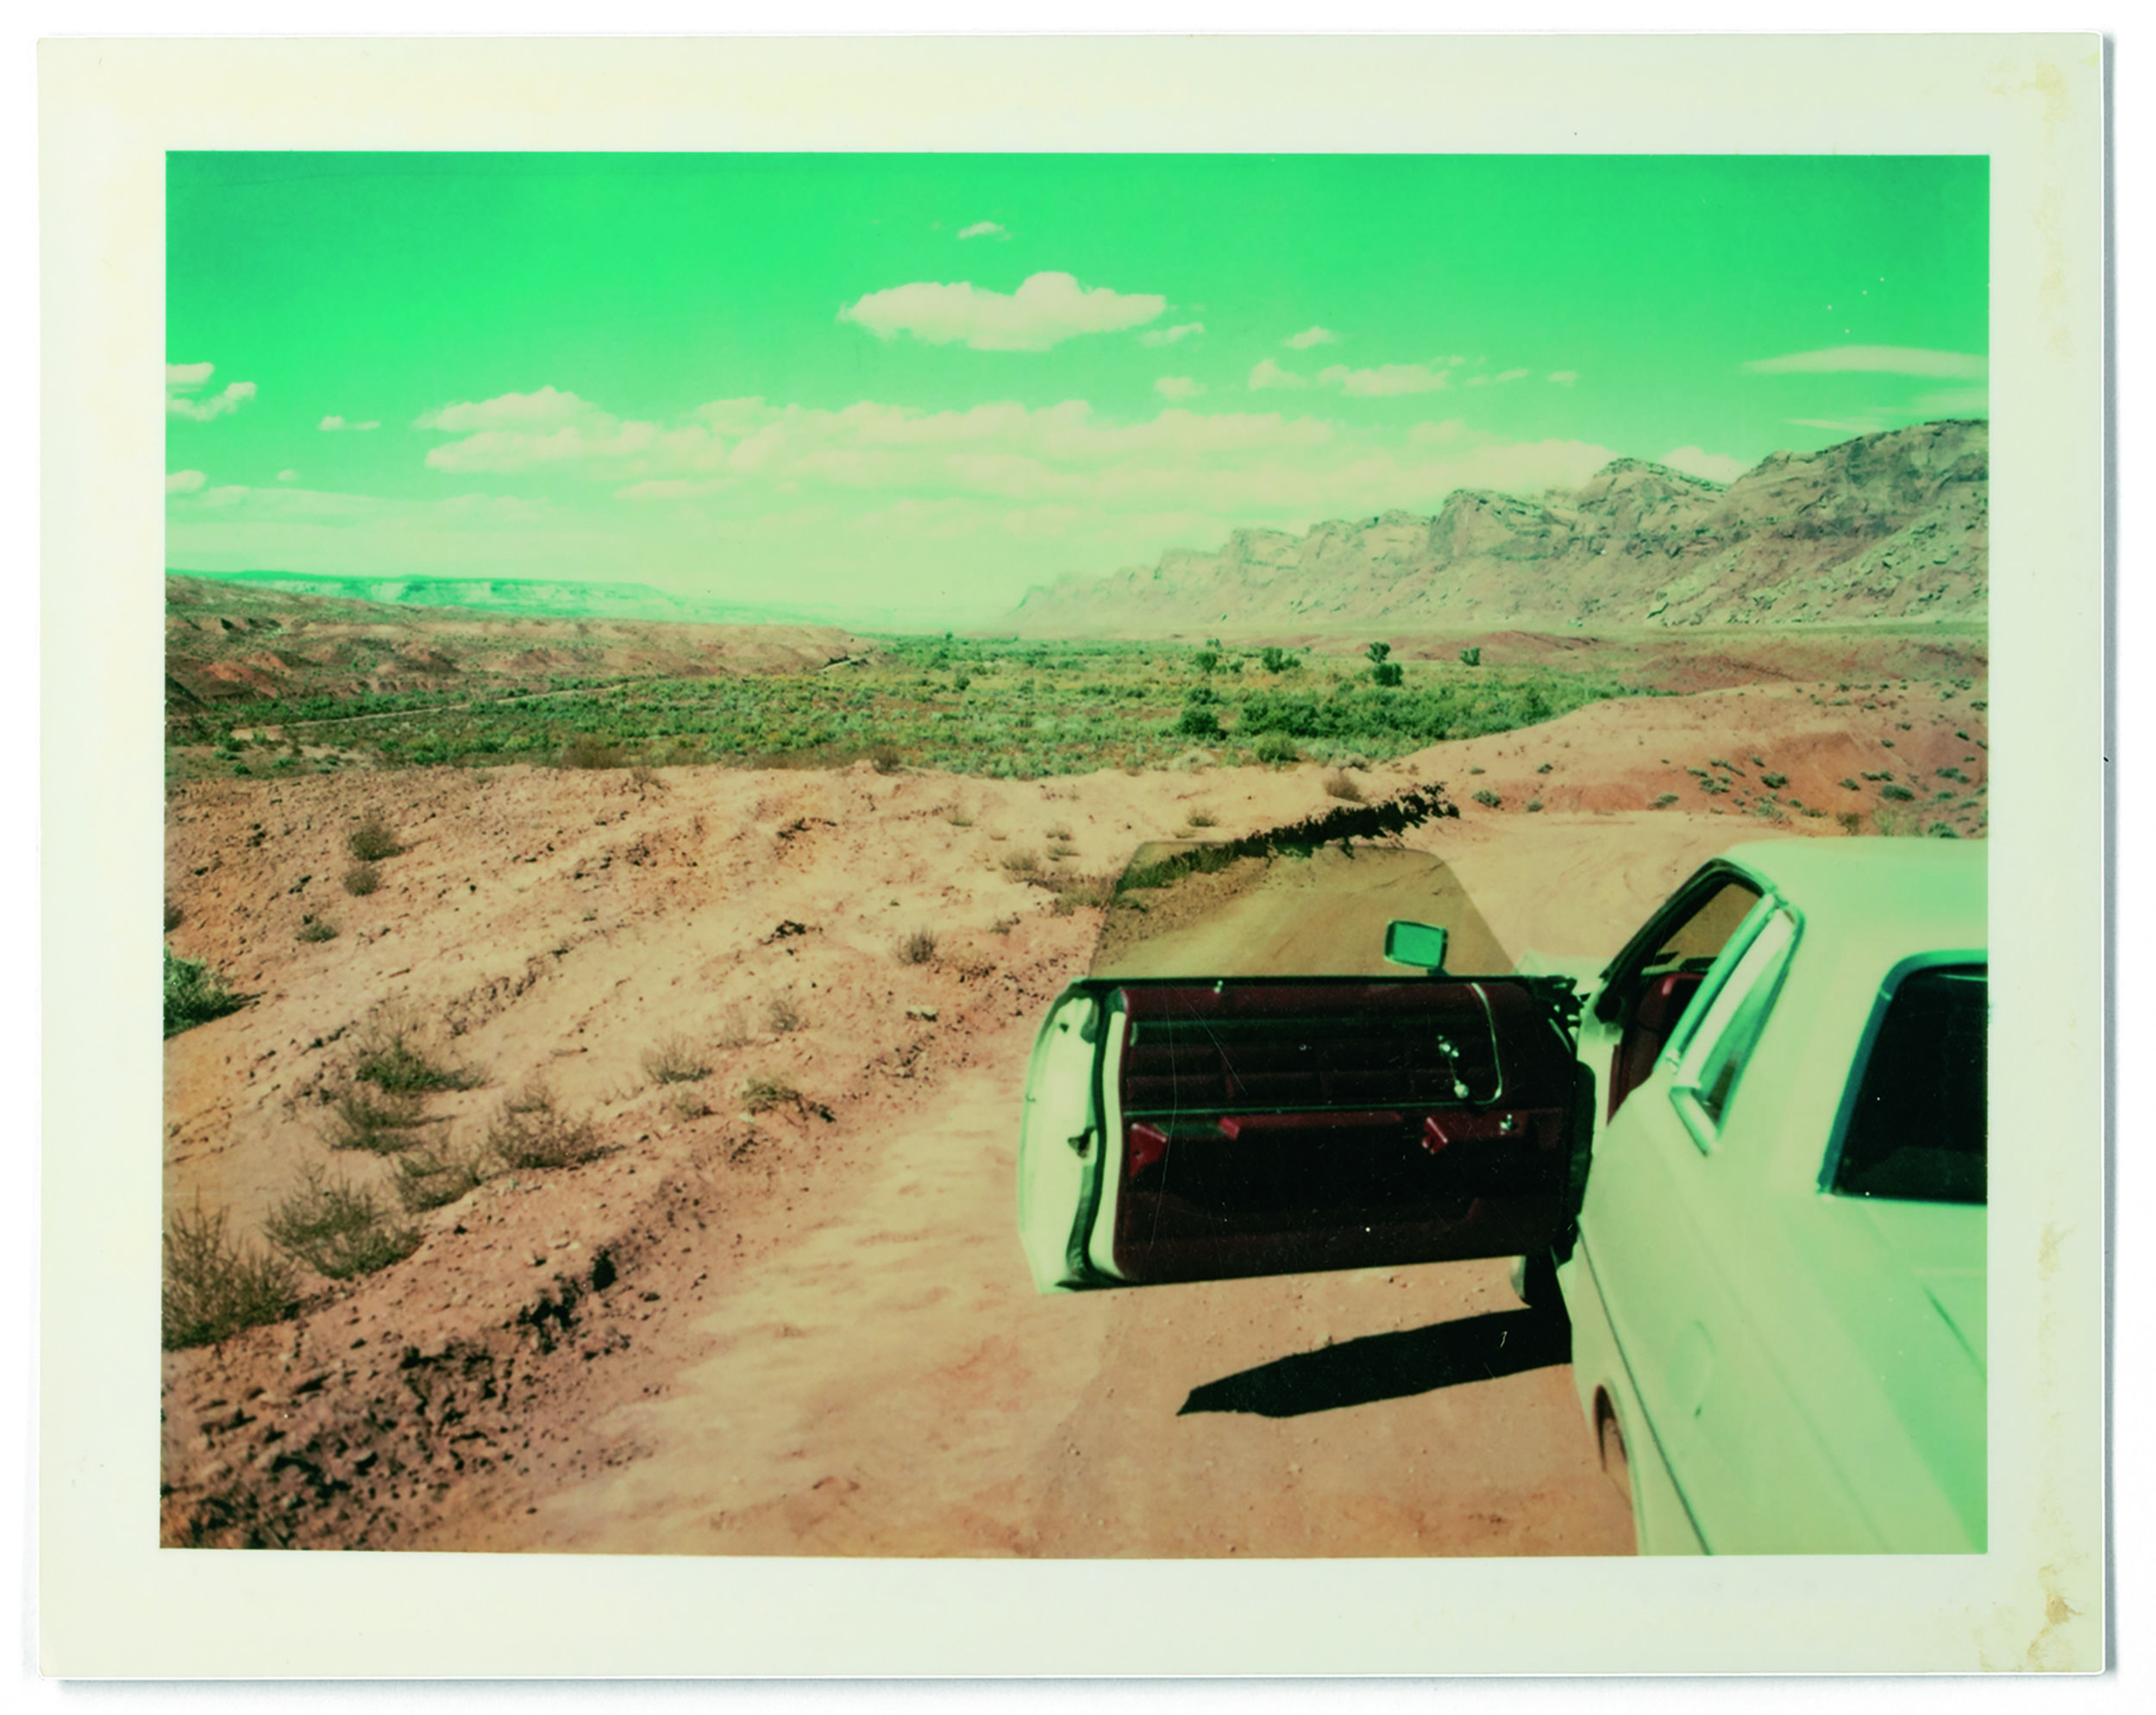 01_ Press Images l Wim Wenders l Valley of the Gods, Utah, 1977.jpg